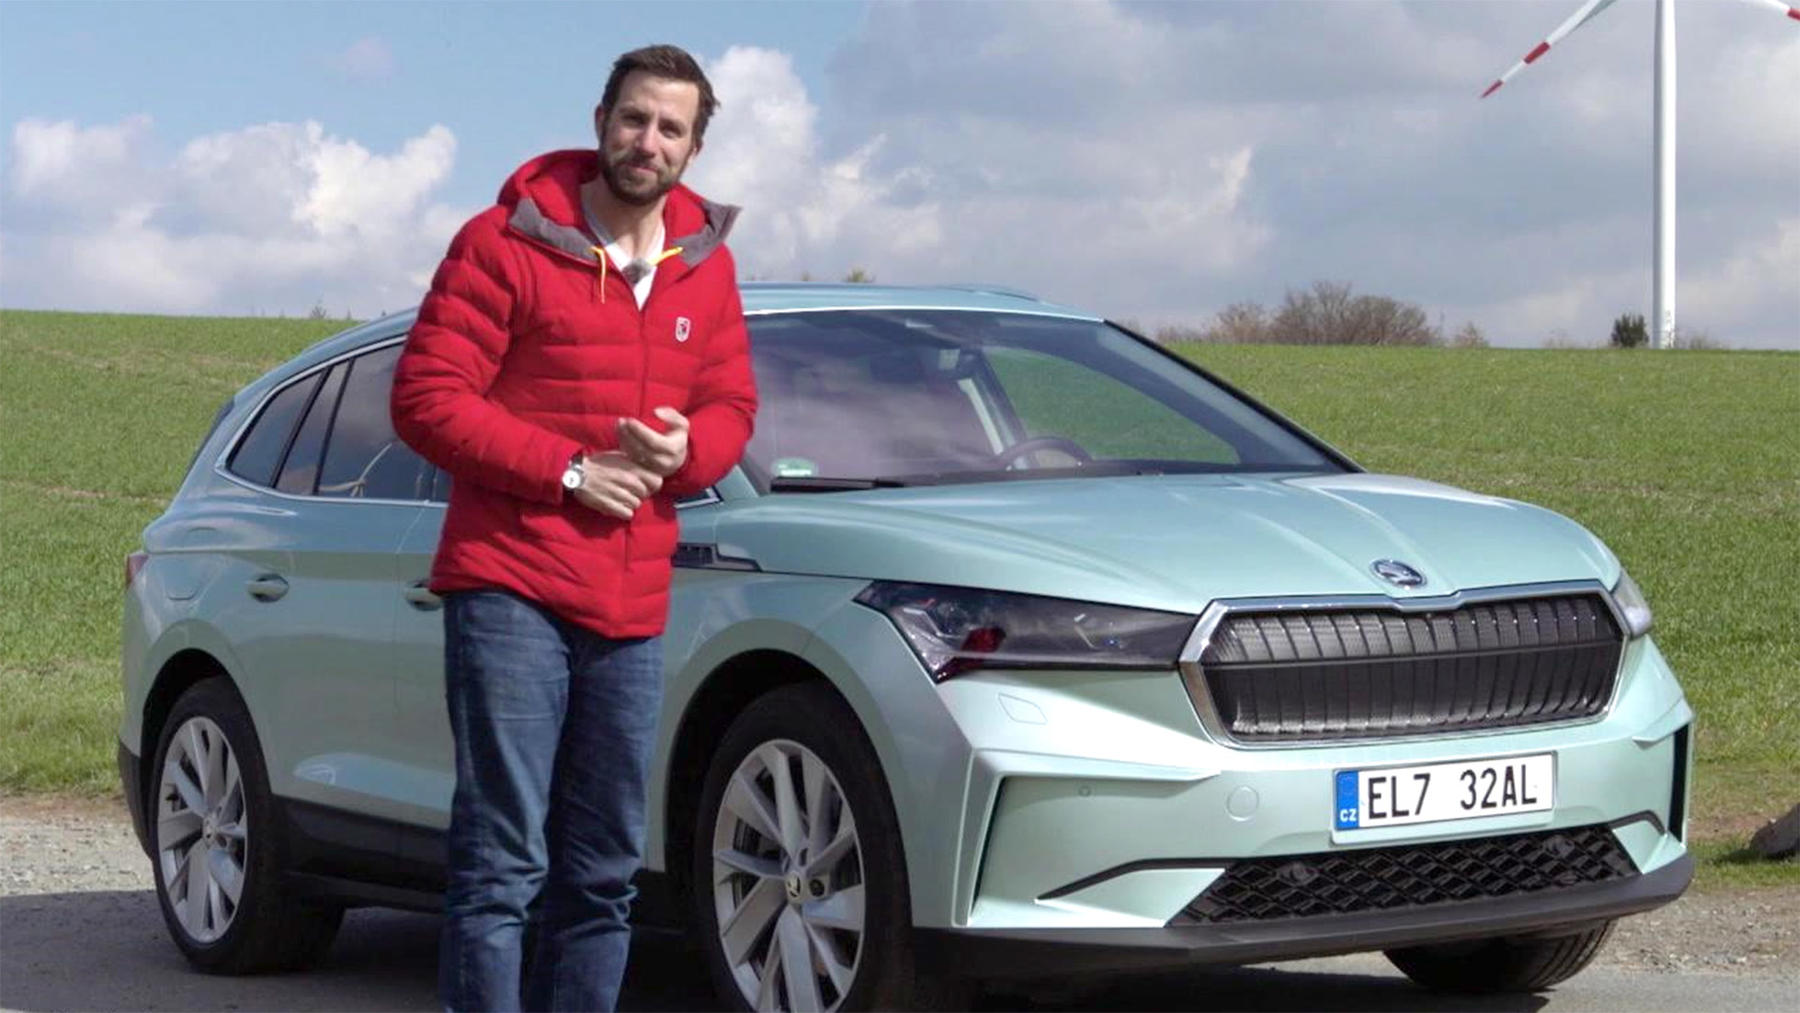 Thema u.a.: Der neue Škoda Enyaq